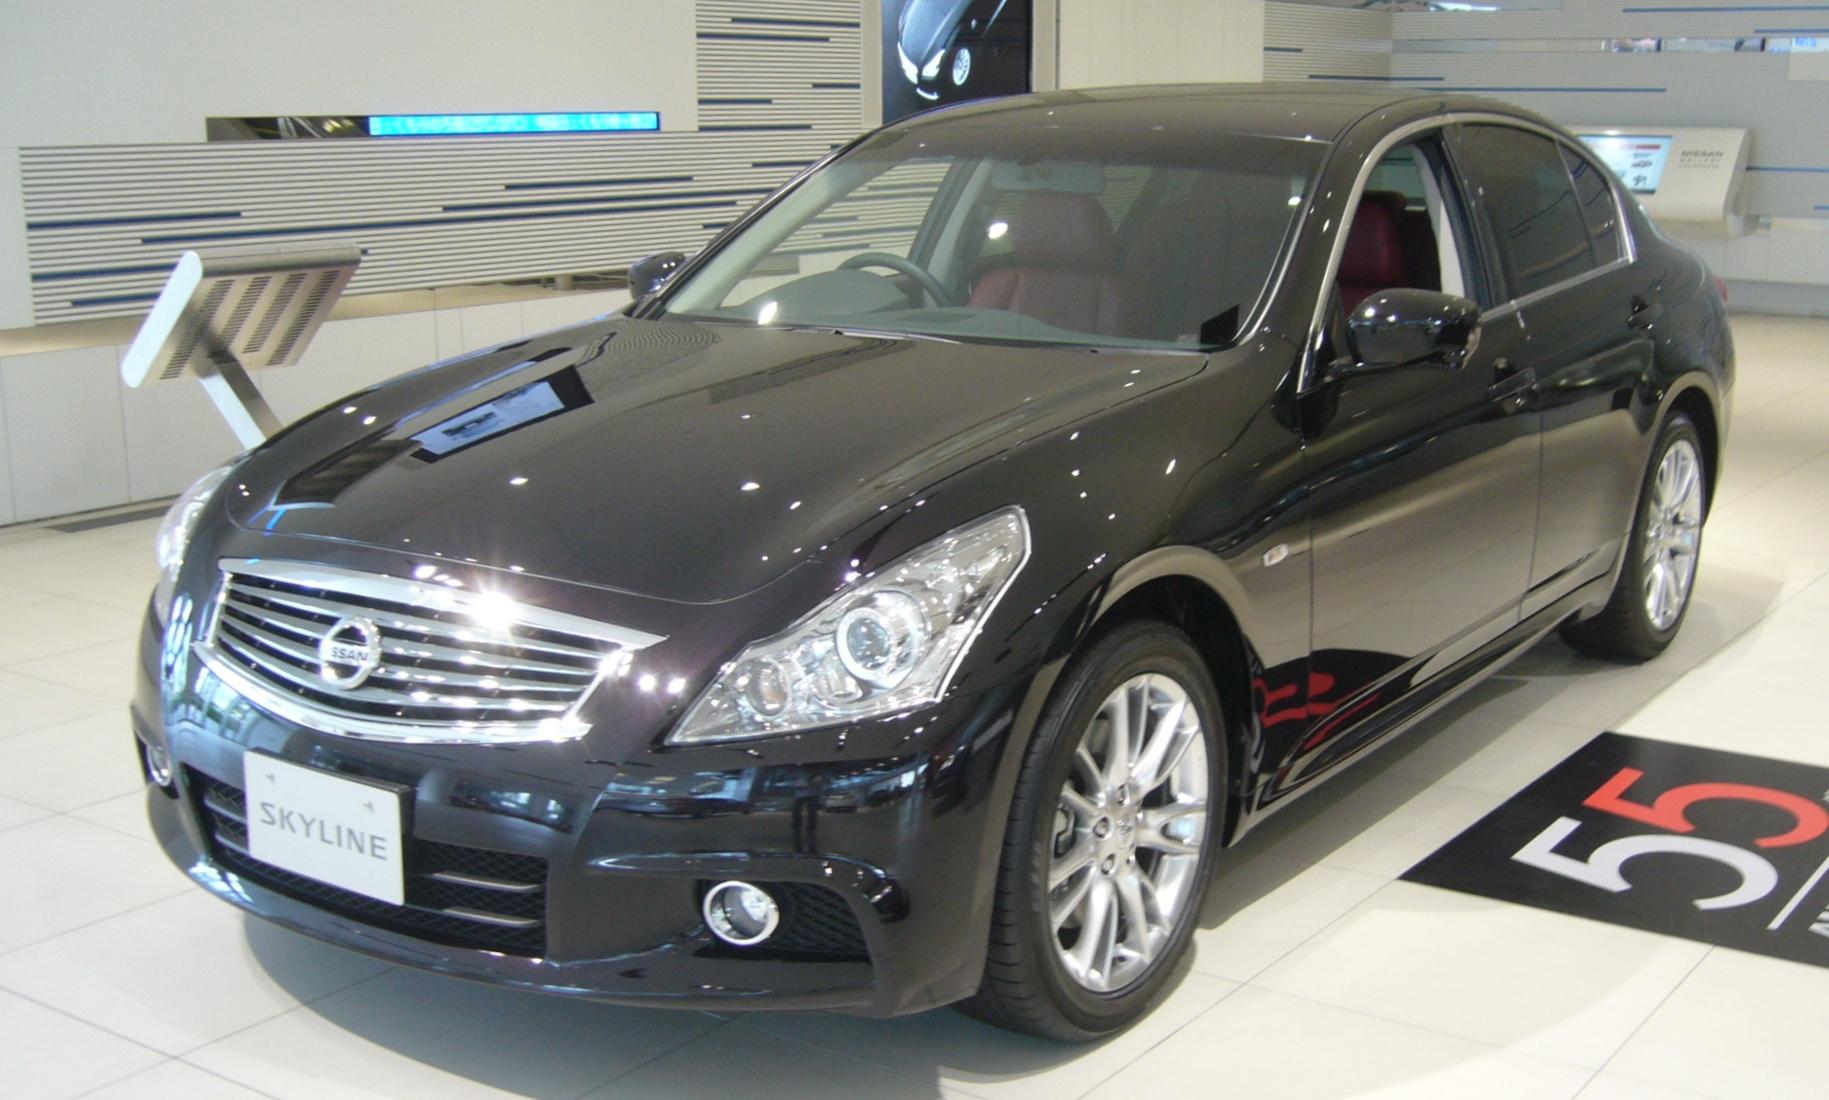 Nissan Skyline 55th Limited 01 Jpg